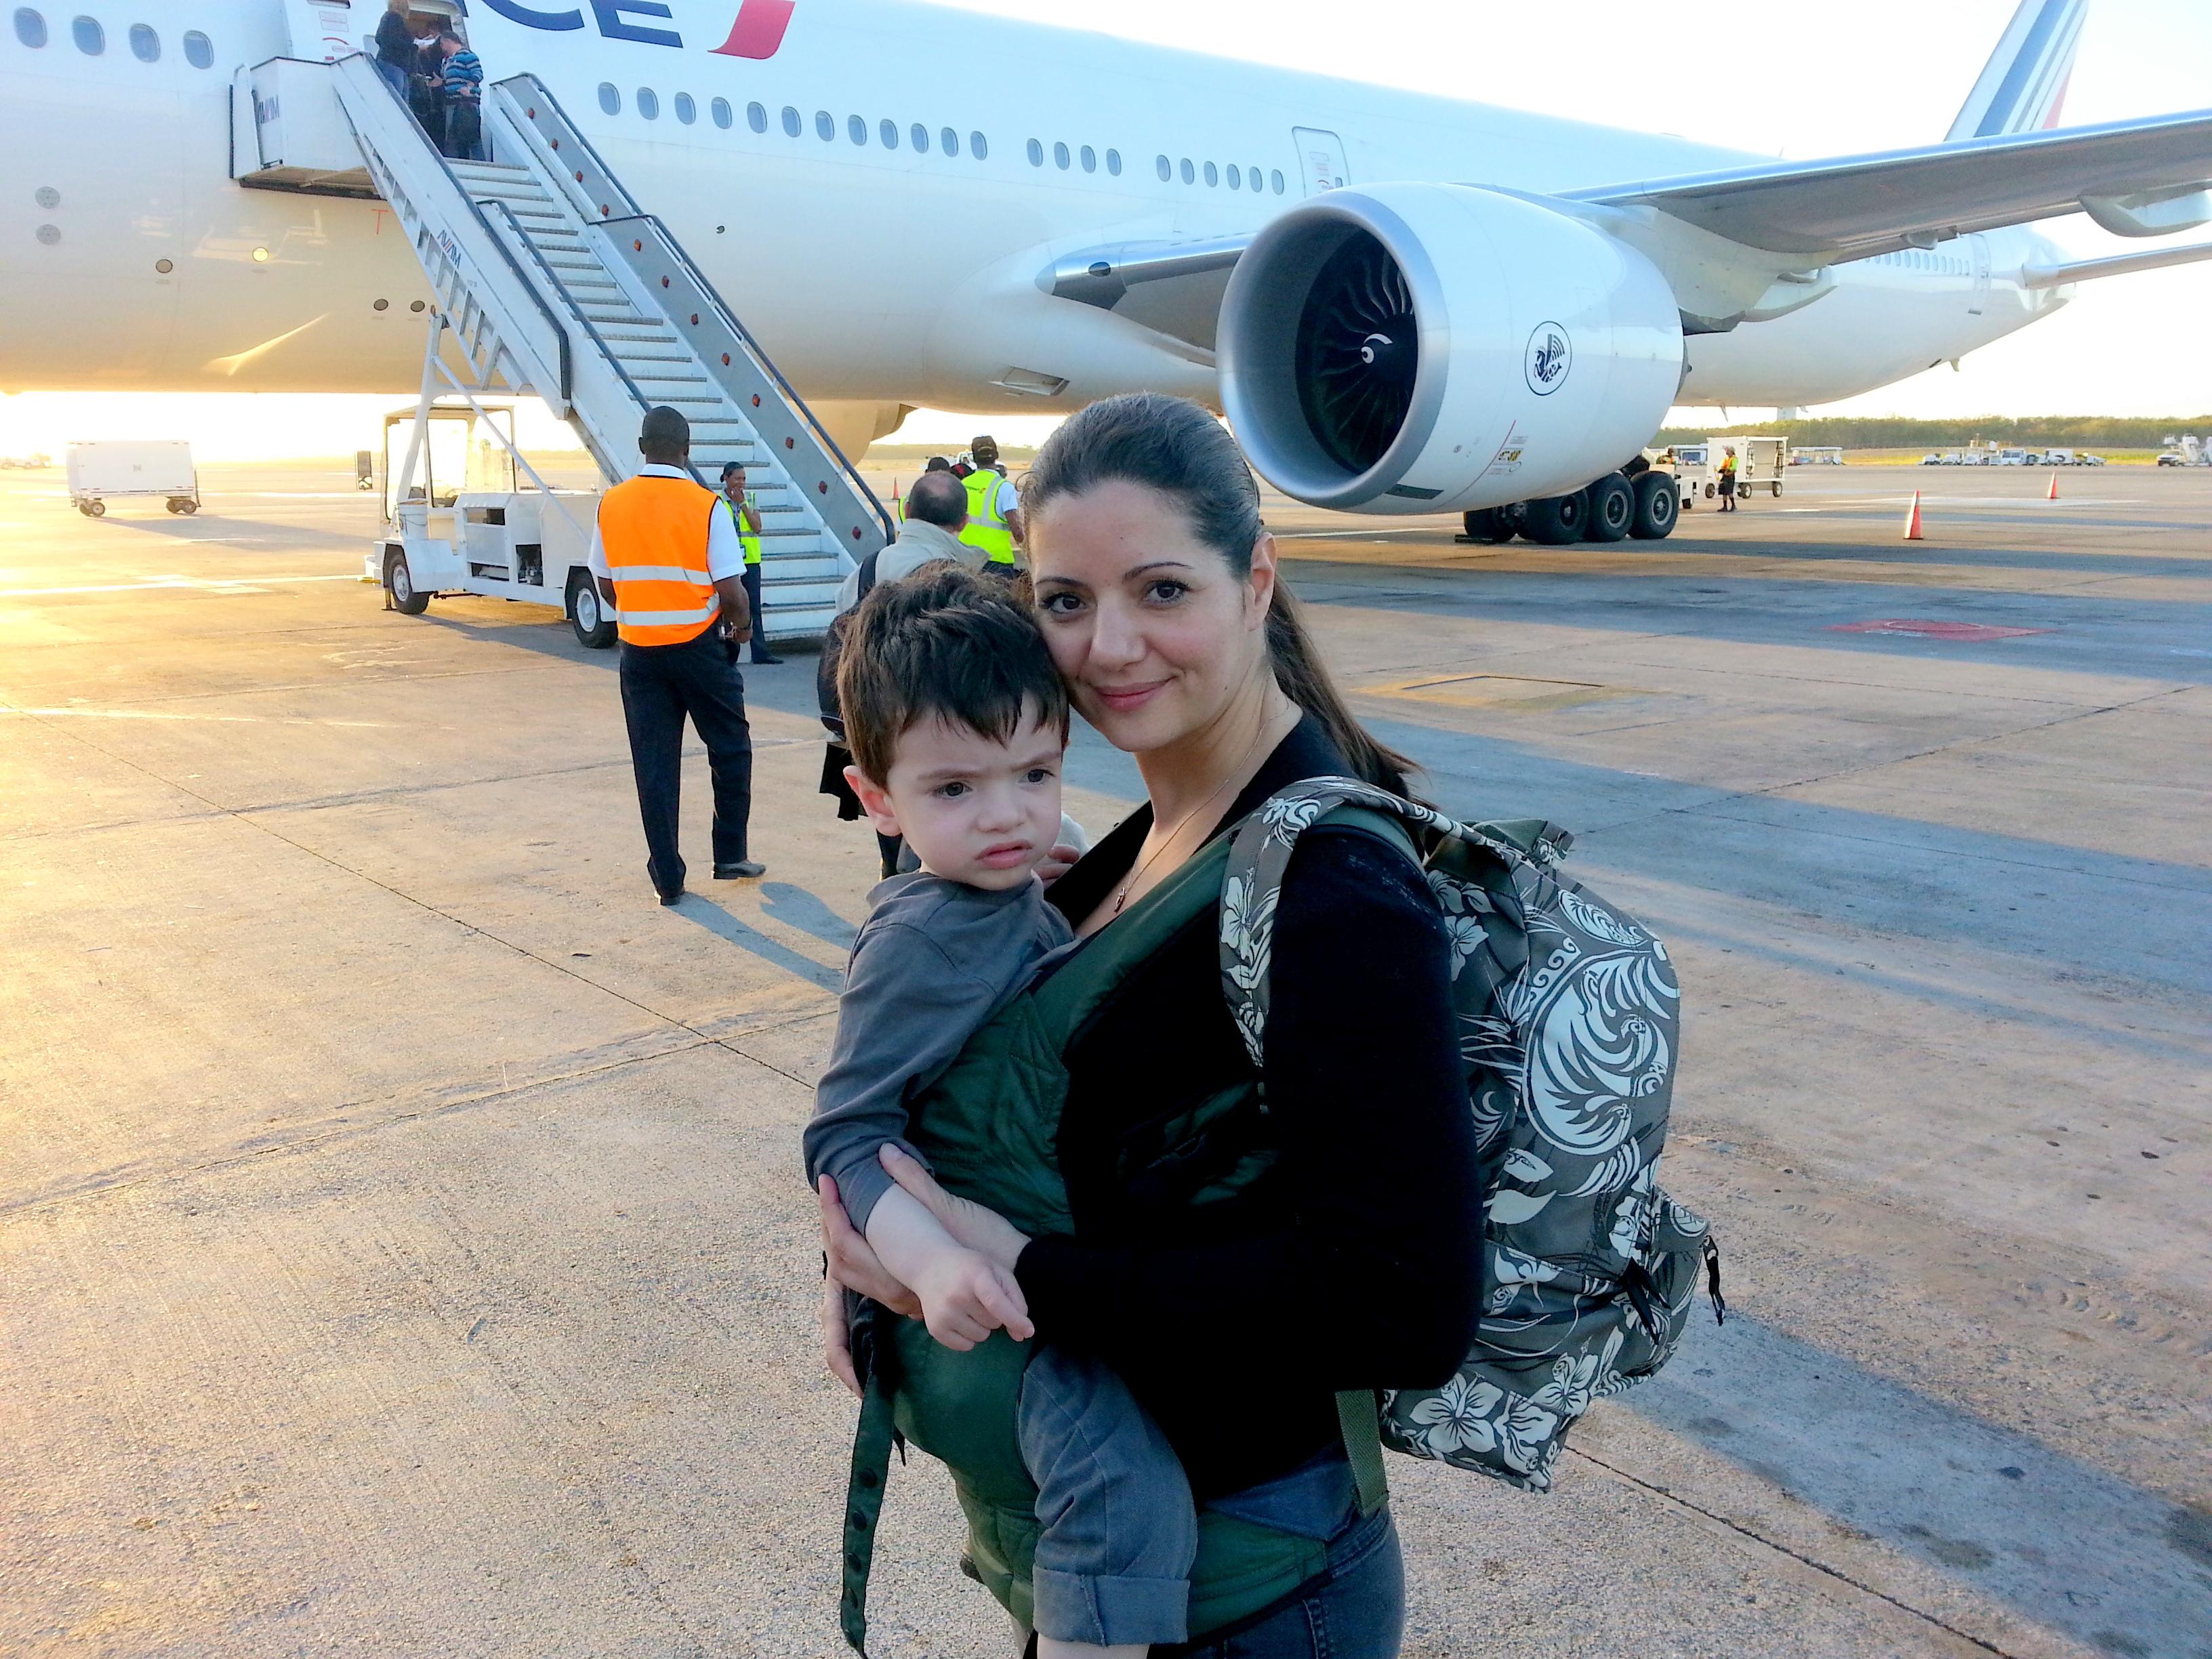 Pour porter en voyage en famille flying mamaflying mama - Rever de porter un bebe dans ses bras ...